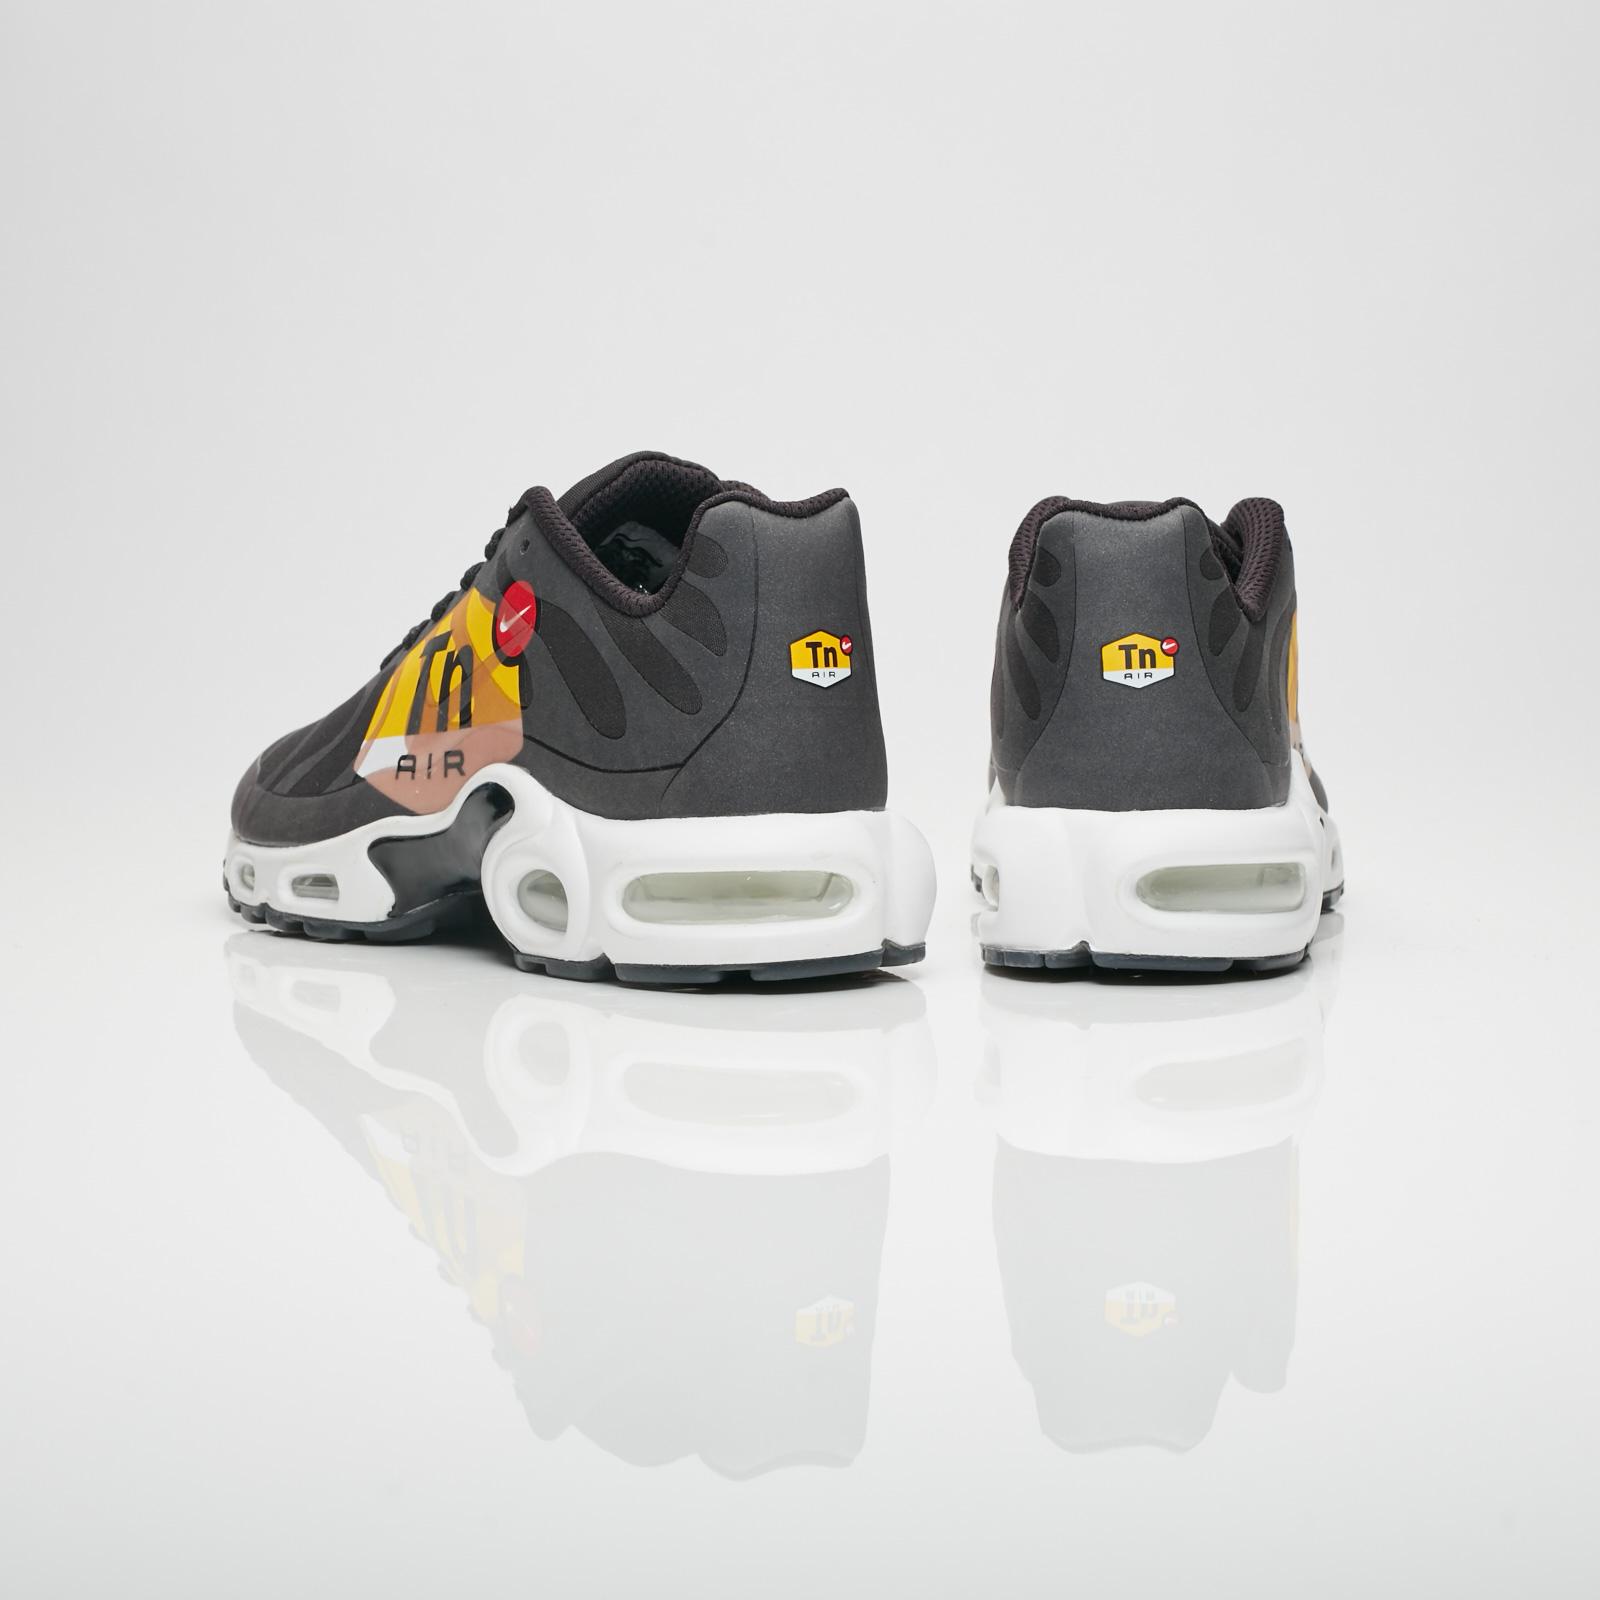 ce4f75c53eb Nike Air Max Plus NS GPX - Aj0877-001 - Sneakersnstuff